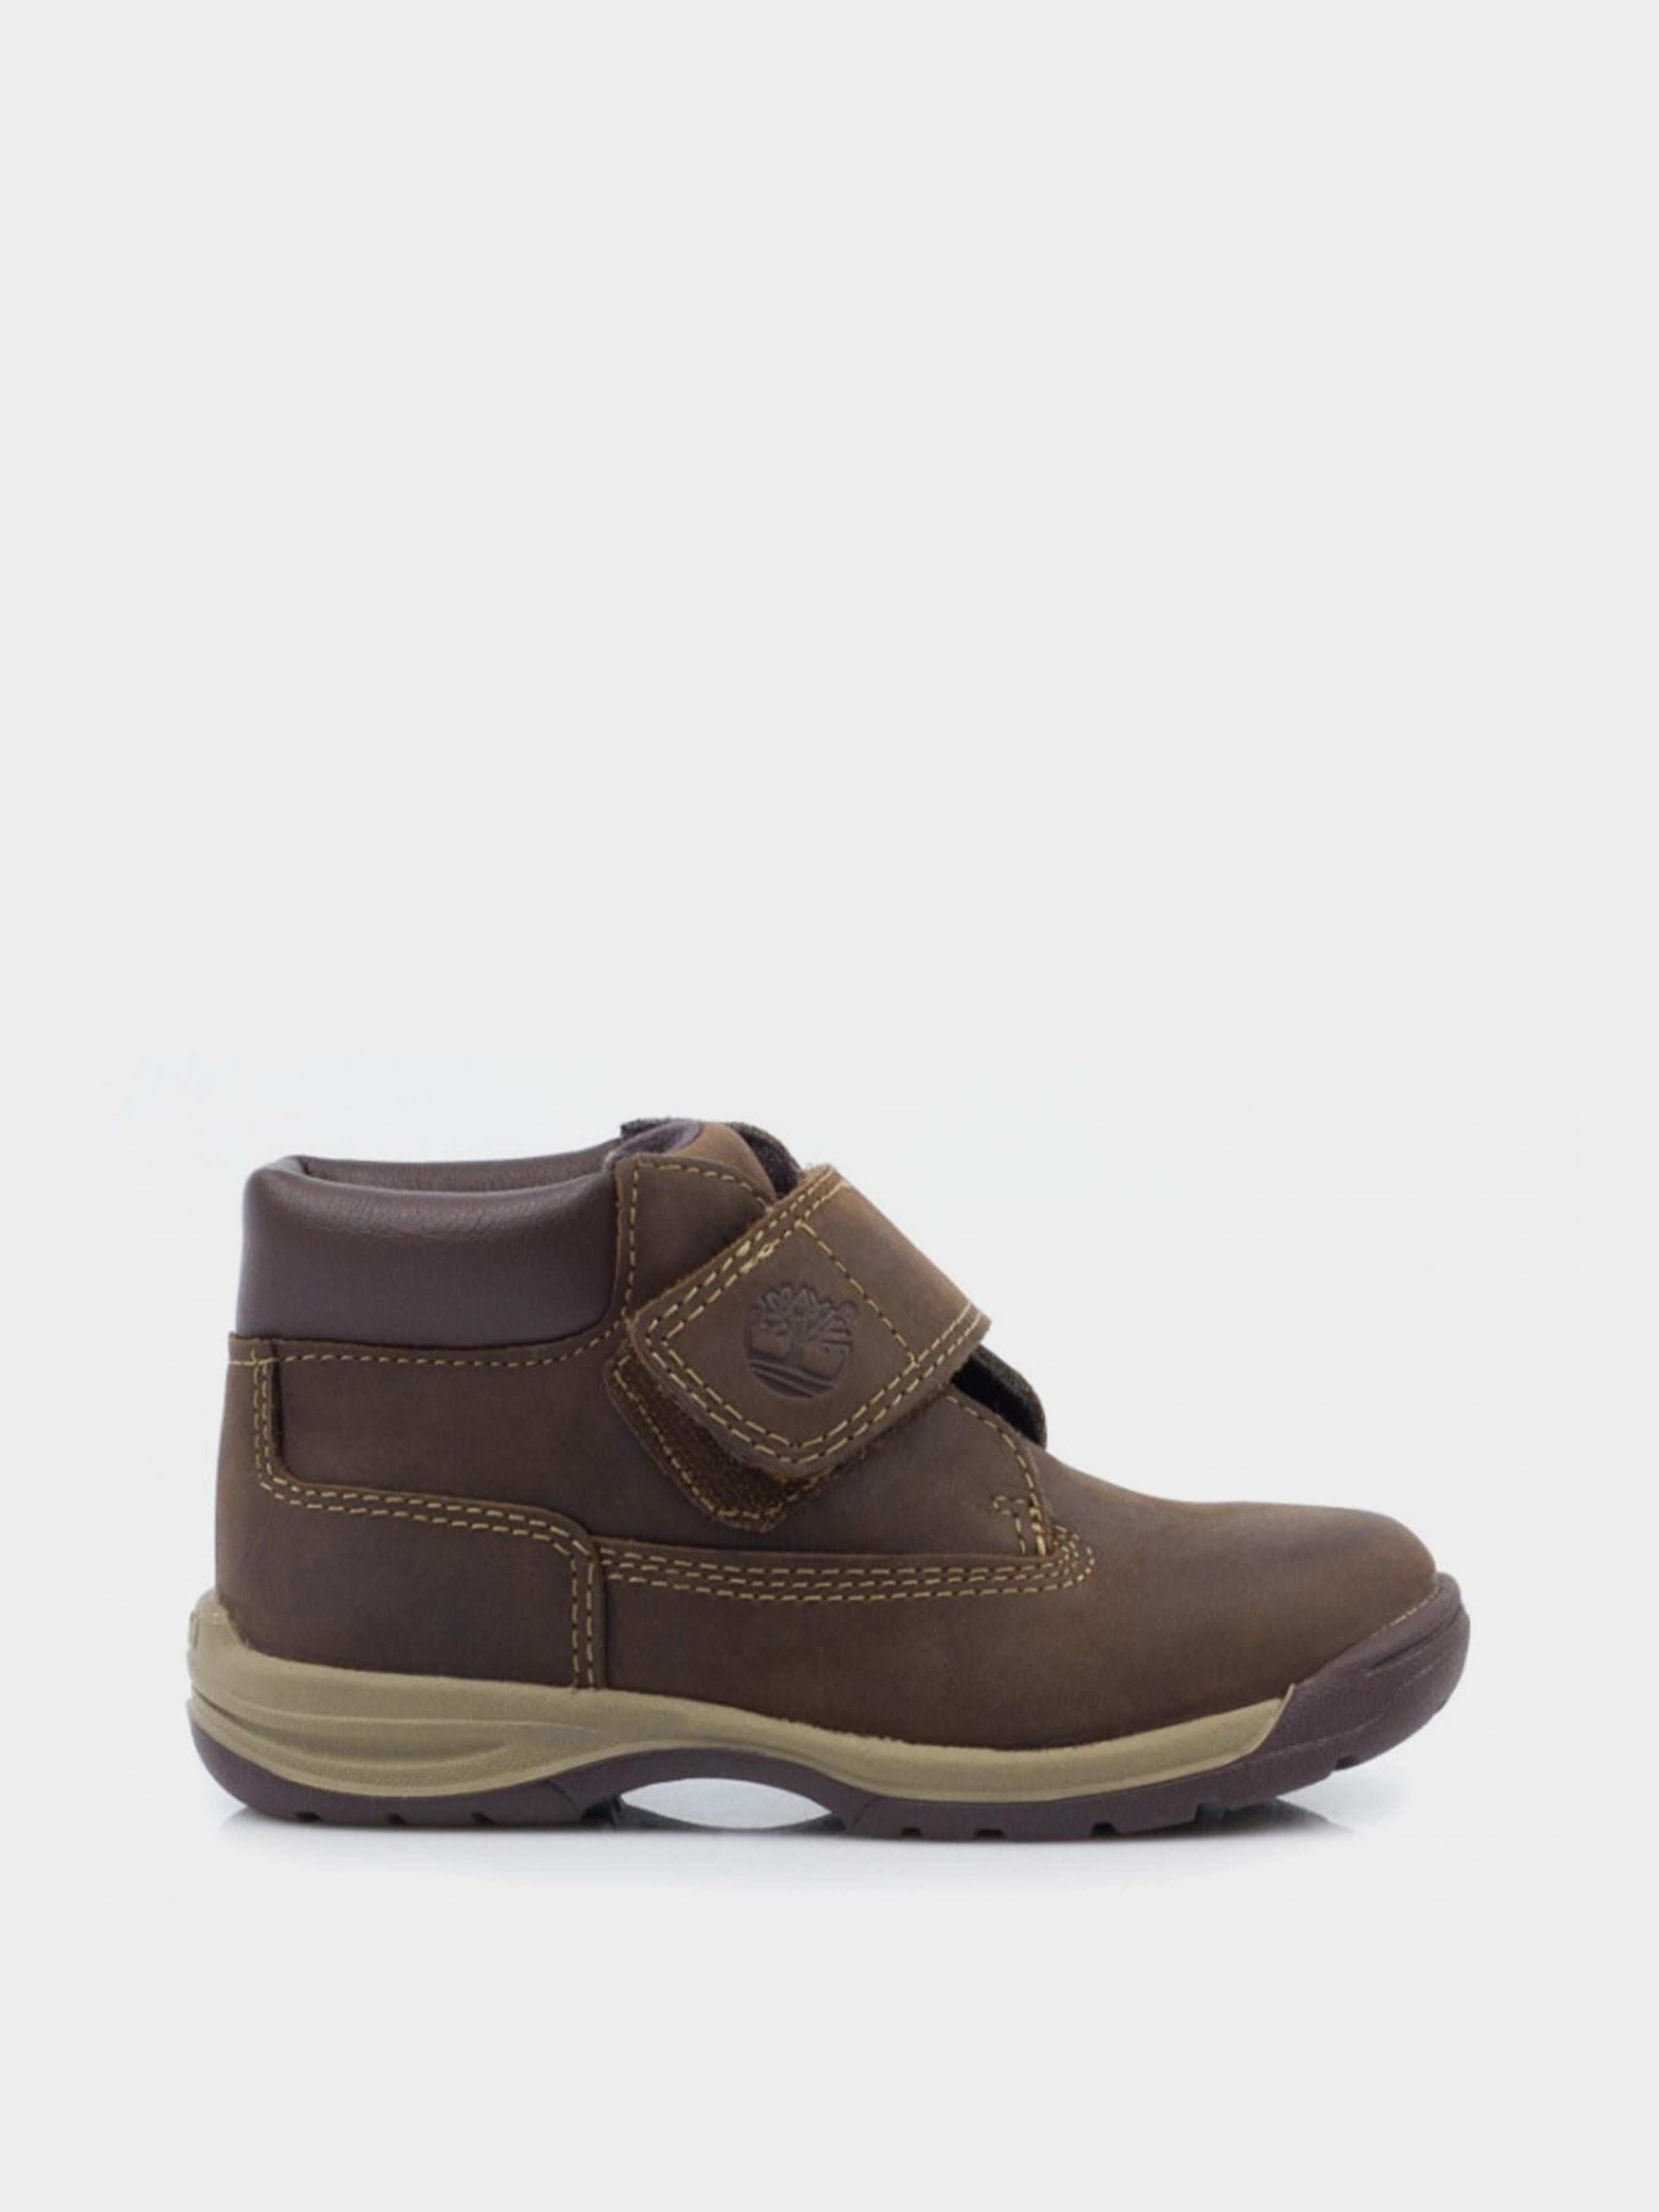 Ботинки для детей Timberland TIMBER TYKES TL1307 купить в Интертоп, 2017 413dac454f6